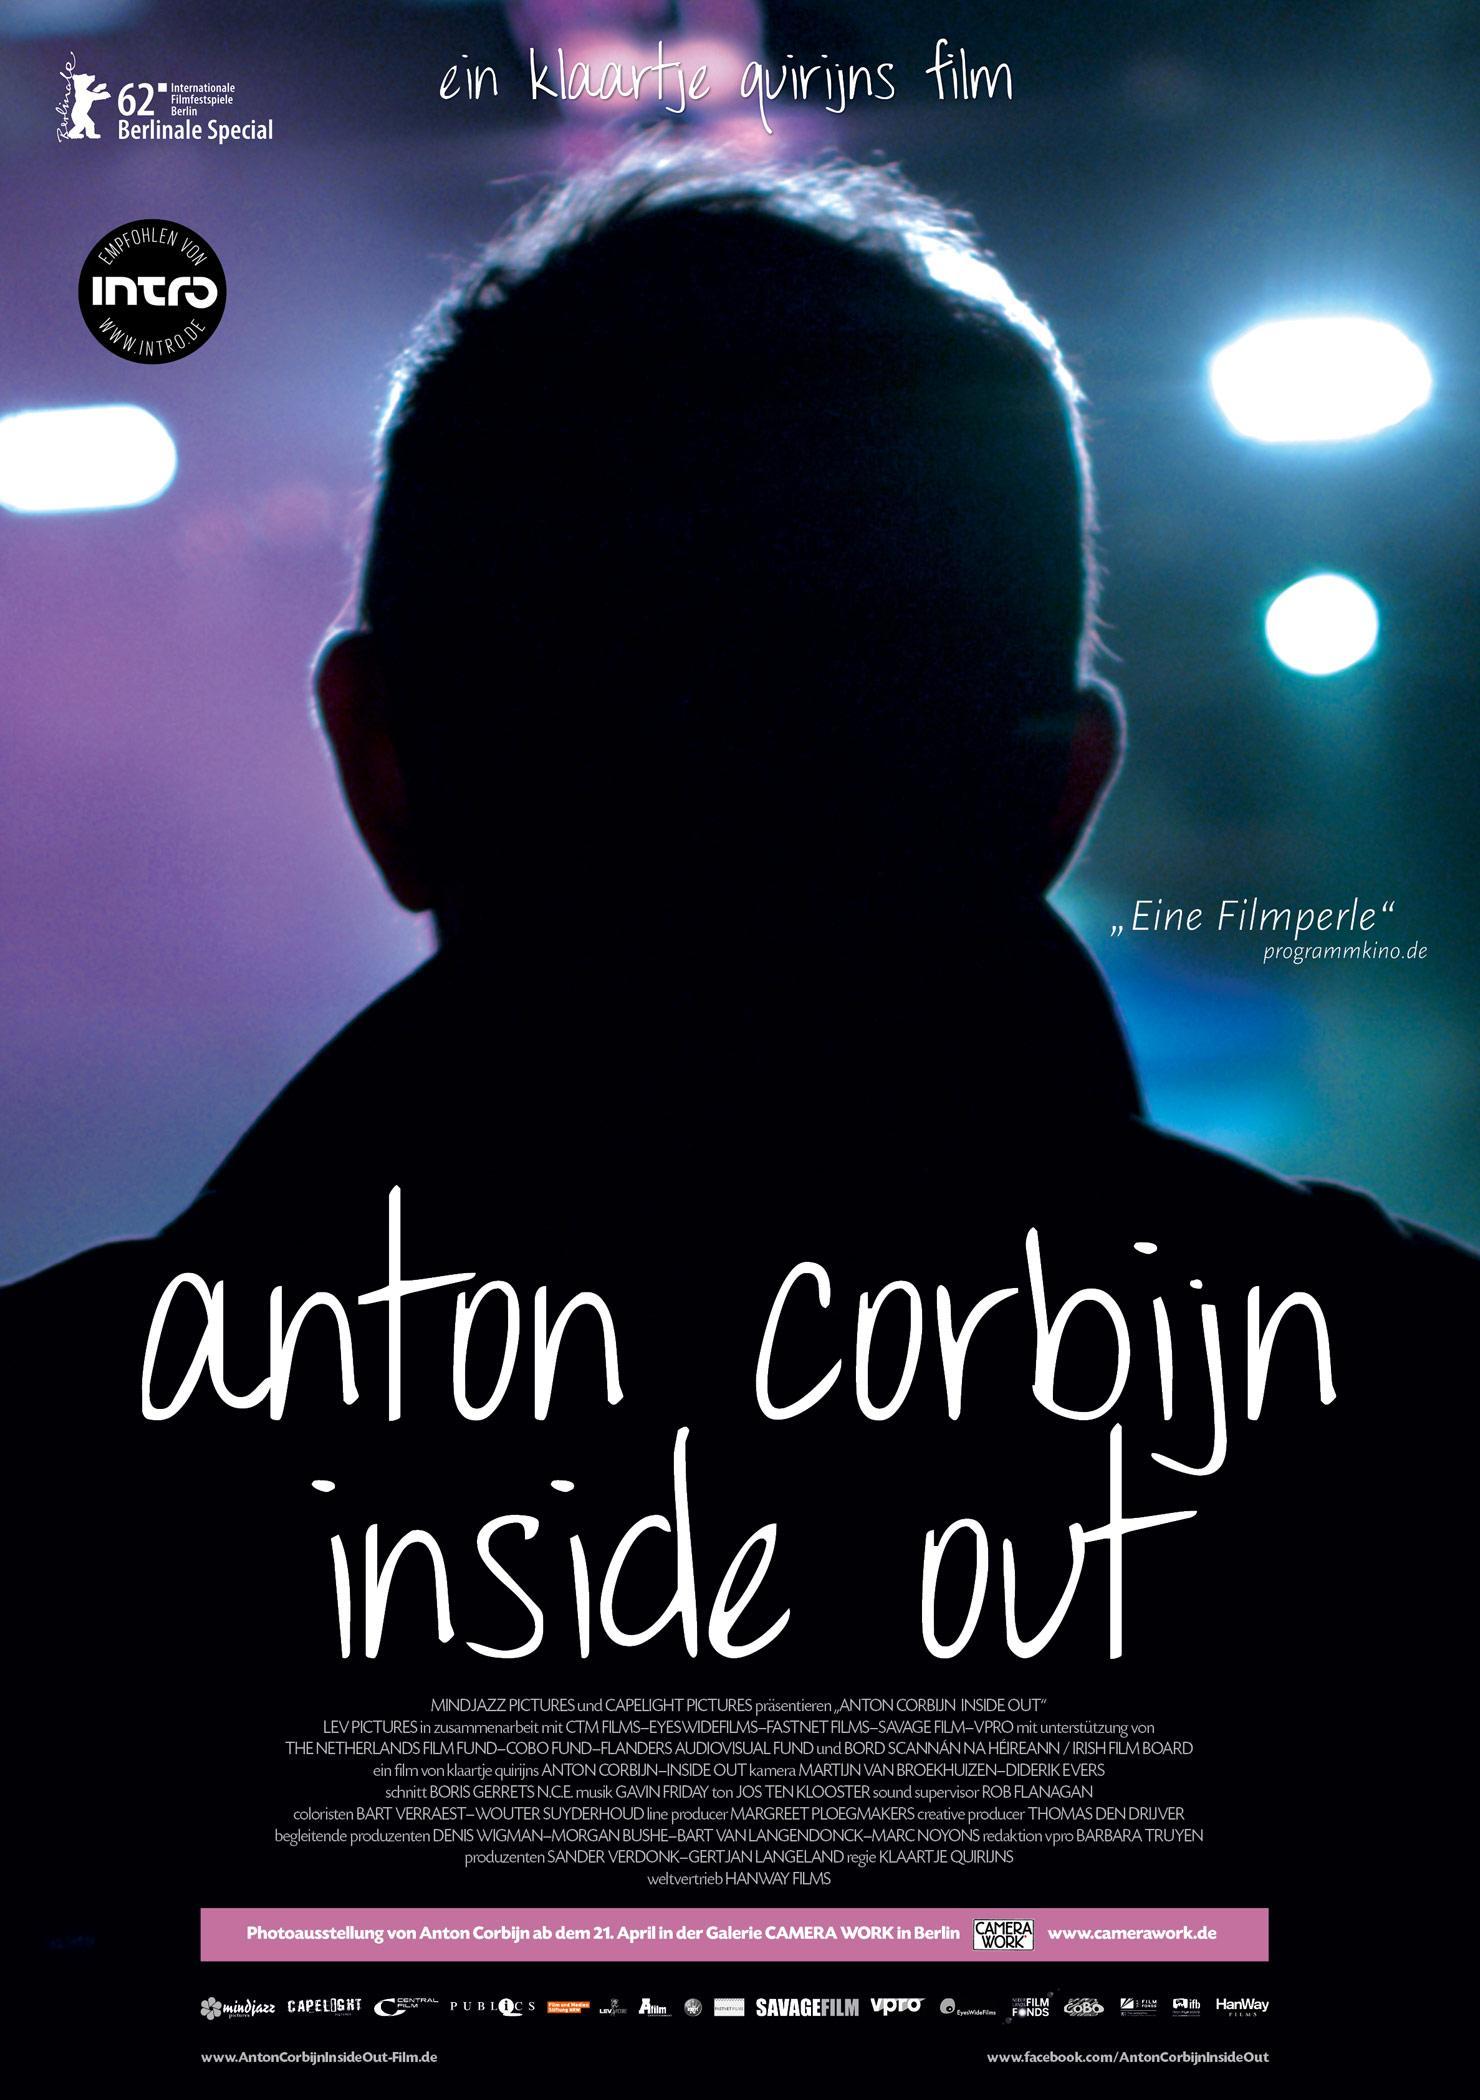 Anton Corbijn Inside Out (Poster)